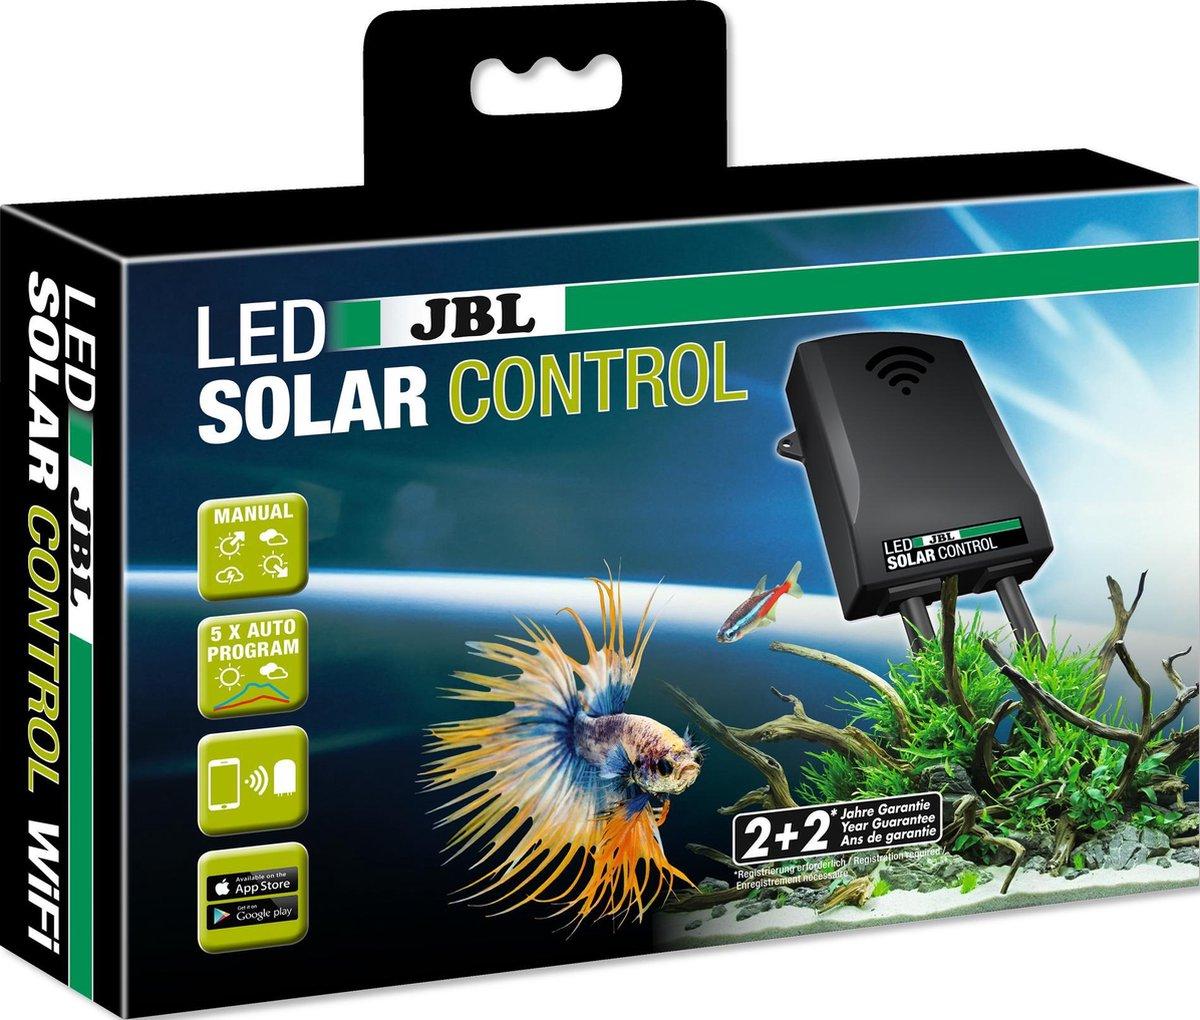 JBL LED SOLAR Control WiFi